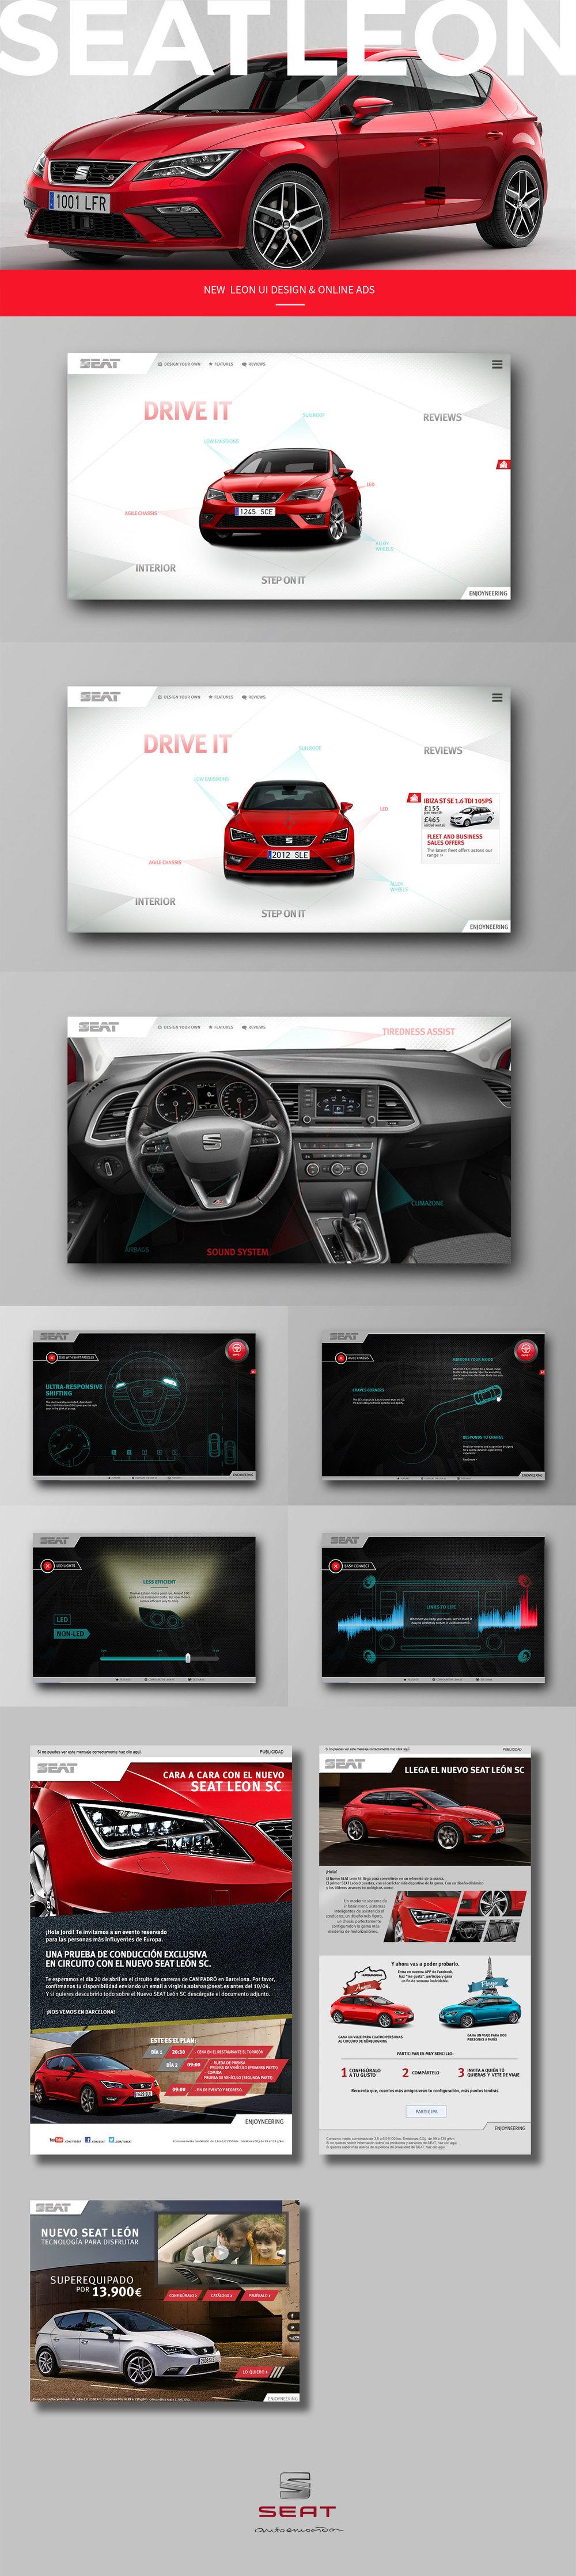 Seat Leon Digital